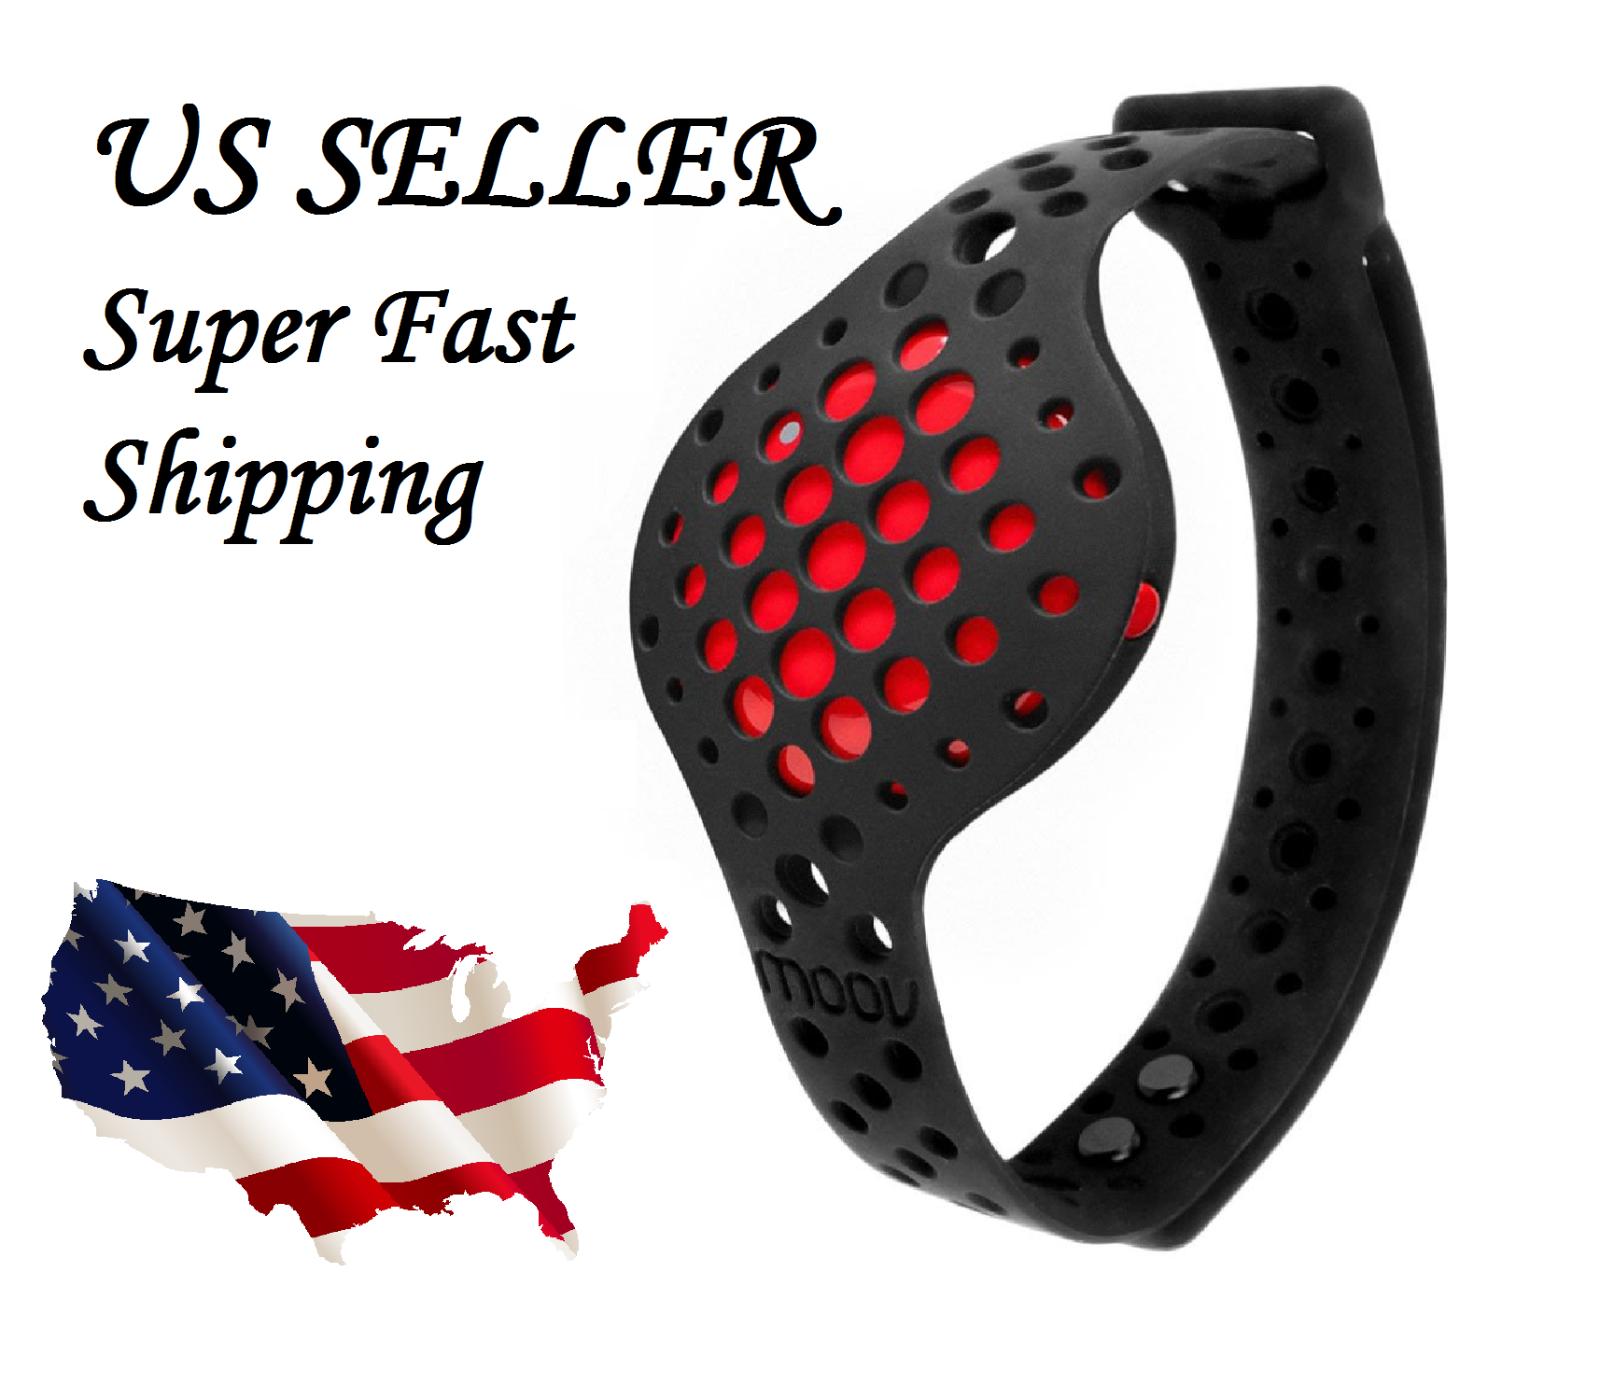 NEW MOOV NOW Strap Fitness Tracker 3d coach audio activity run swim box sport US - $19.79 - $69.29